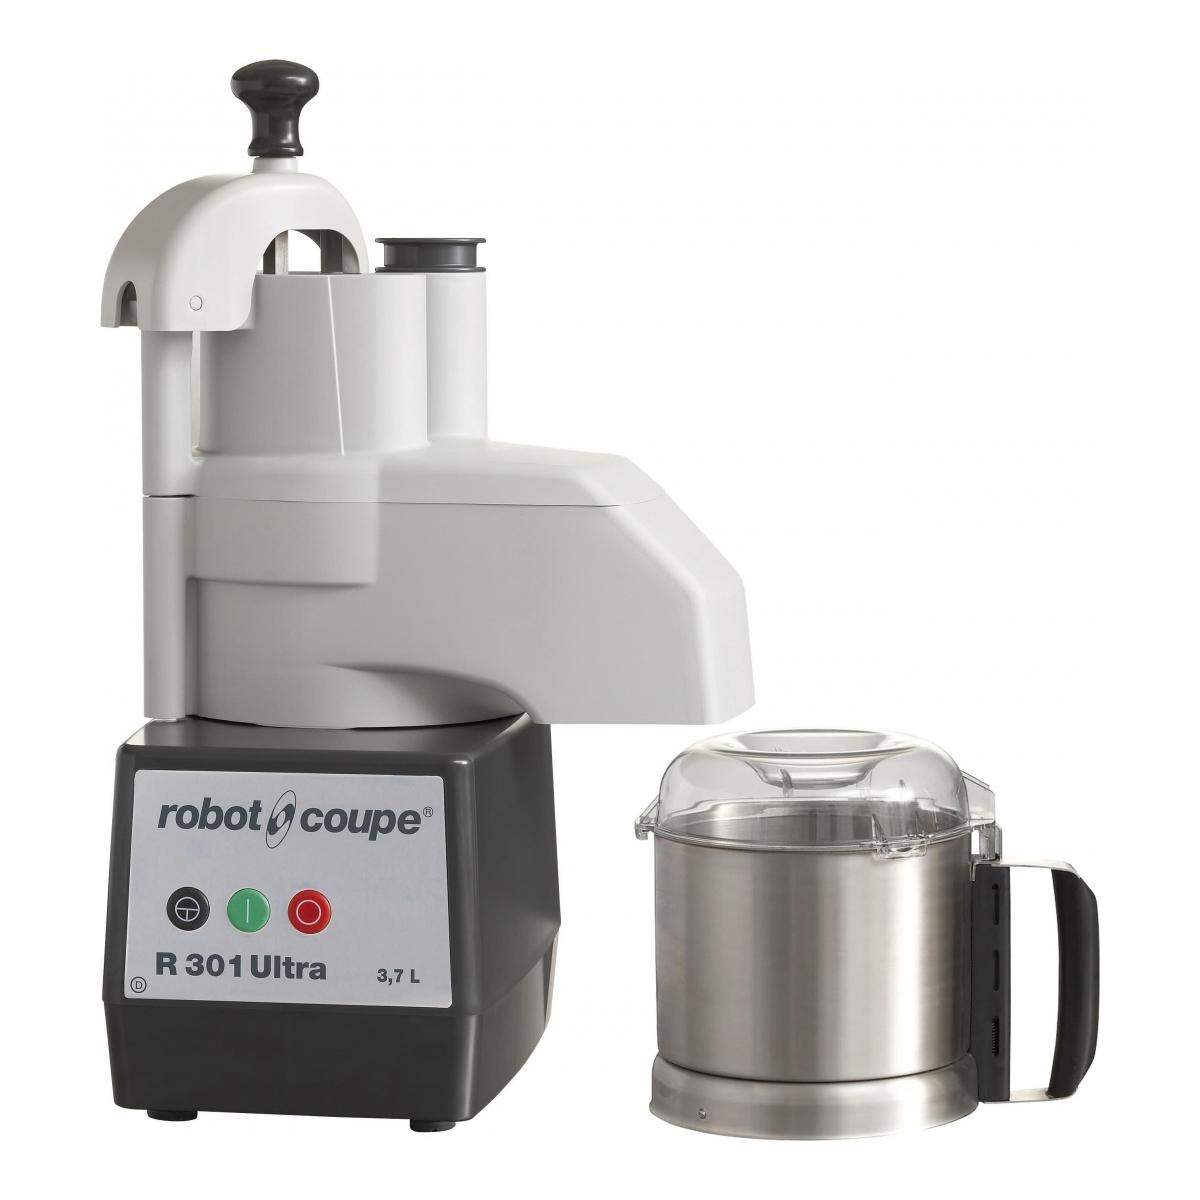 Кухонный процессор Robot Coupe R 301 Ultra (+ 4 D) арт. 2204)